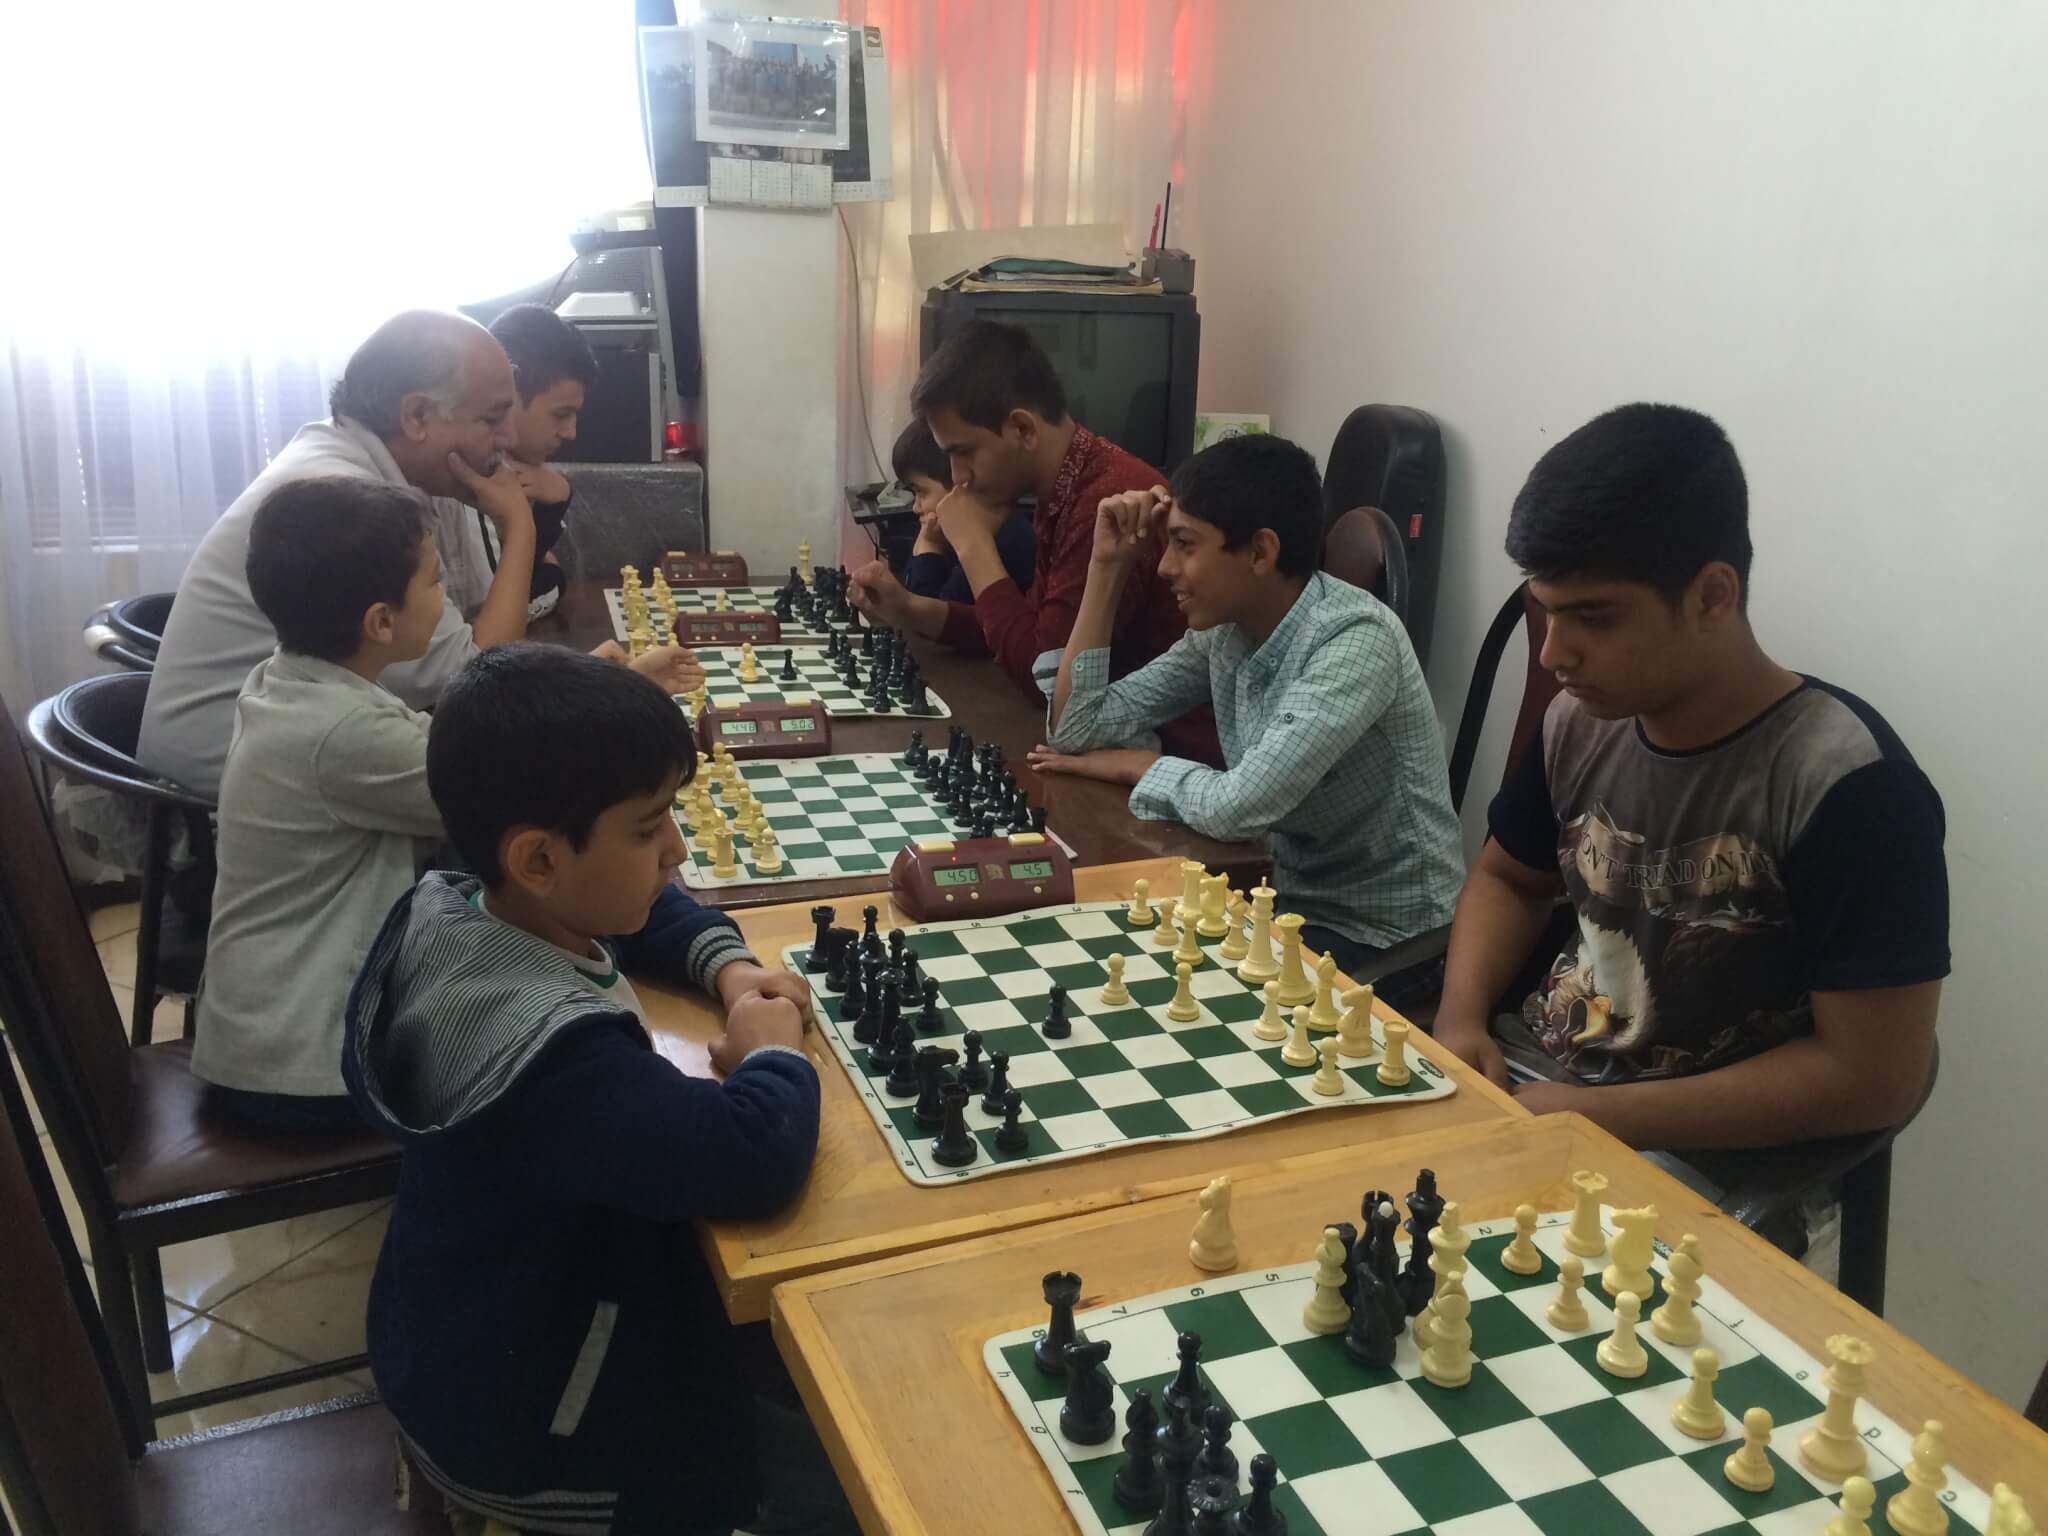 گزارش اولین مسابقه بلیتس هیات شطرنج رباط کریم به مناسبت هفته تربیت بدنی